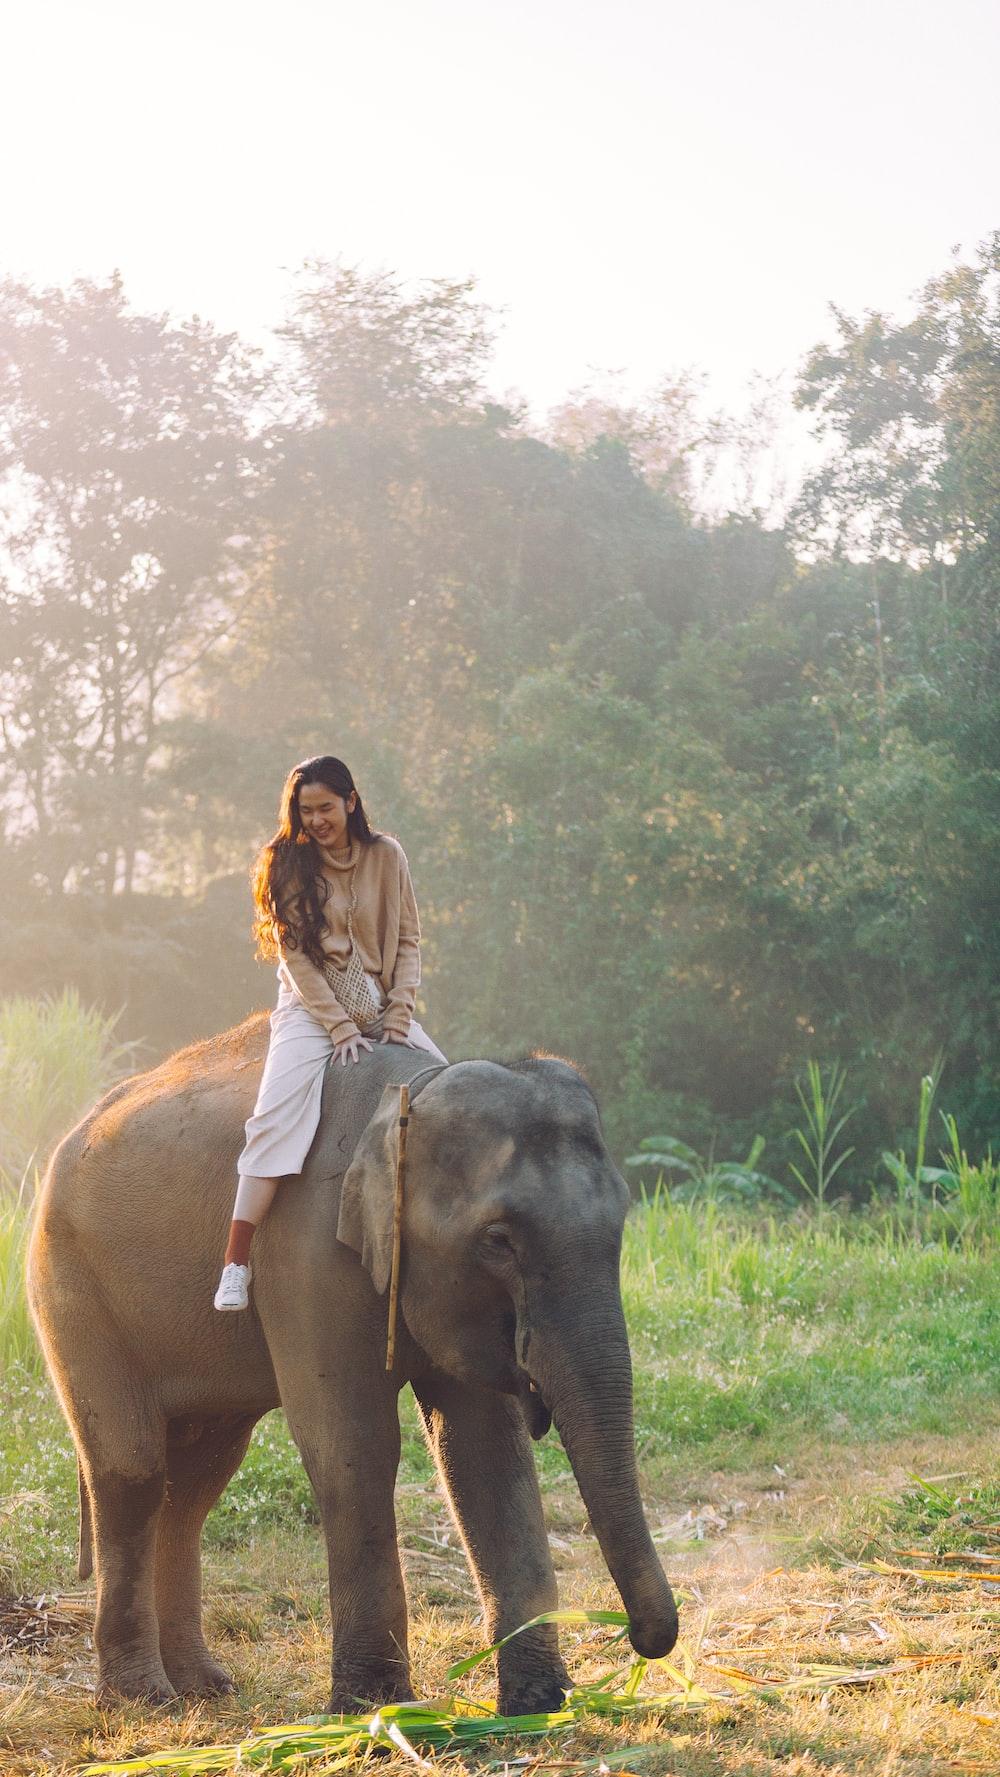 woman riding on black elephant during daytime